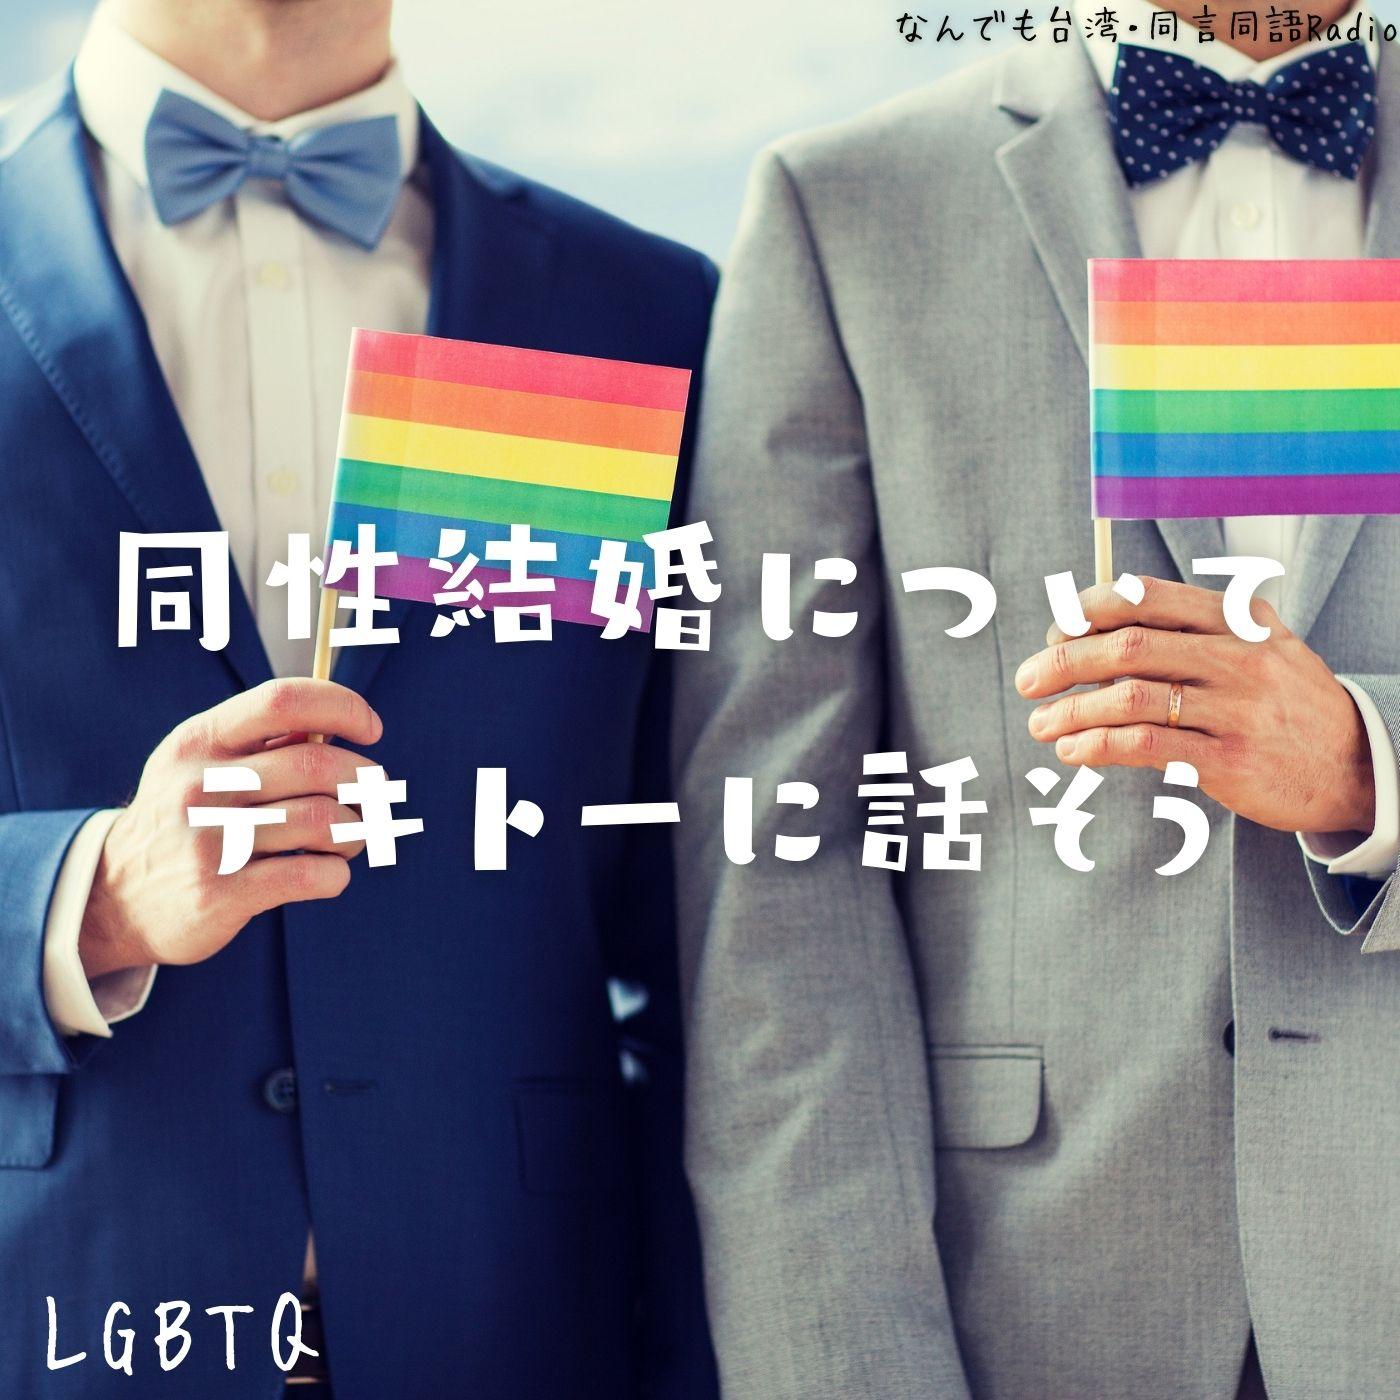 EP29 - (JP)【LGBTQ・雑談】同性結婚と言えば、思い浮かんだことをテキトーに話す回